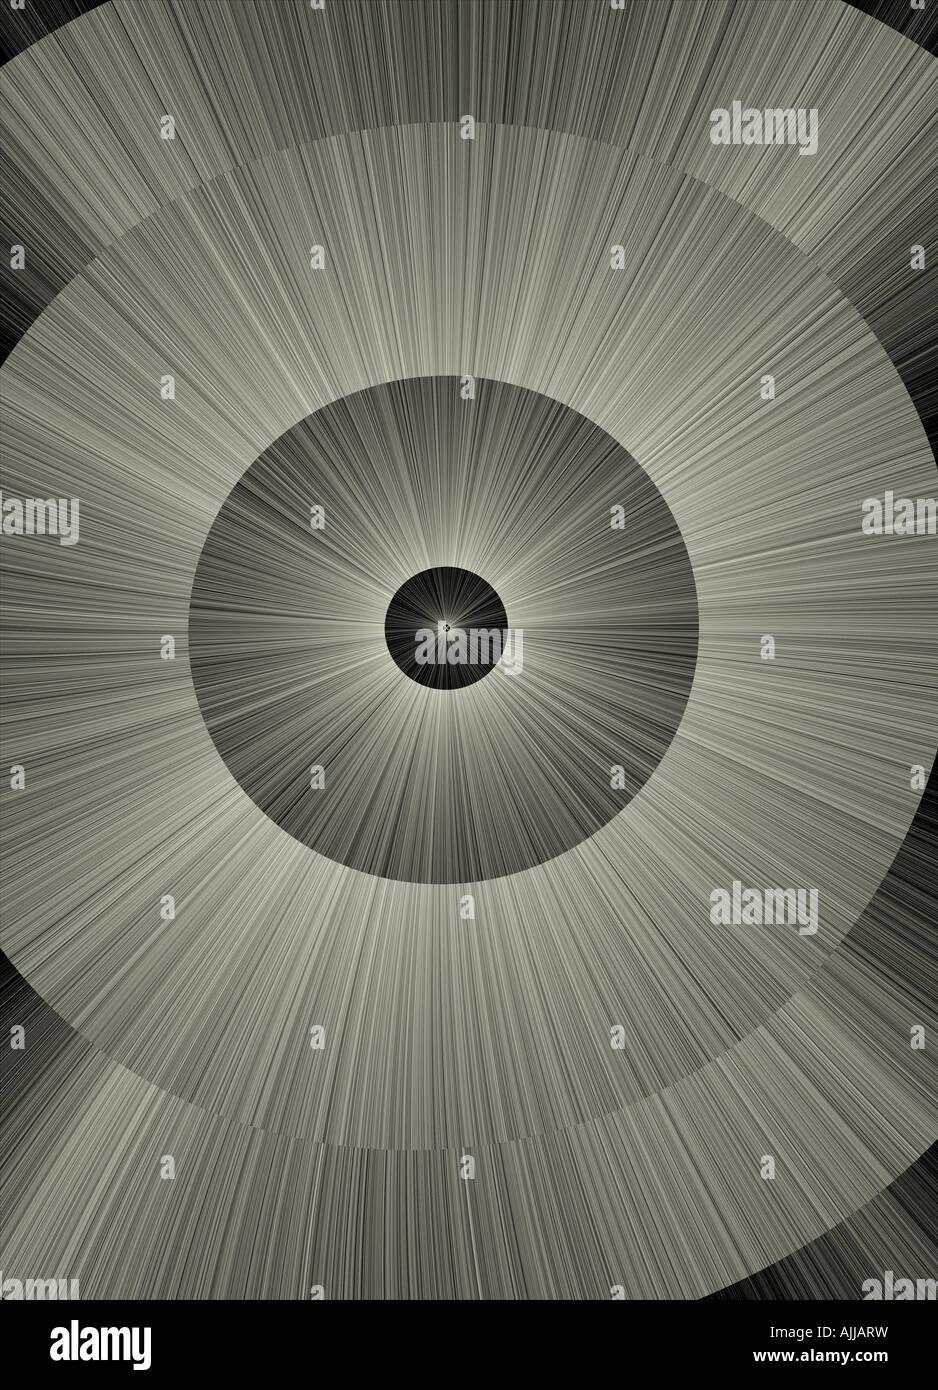 Circular design - Stock Image